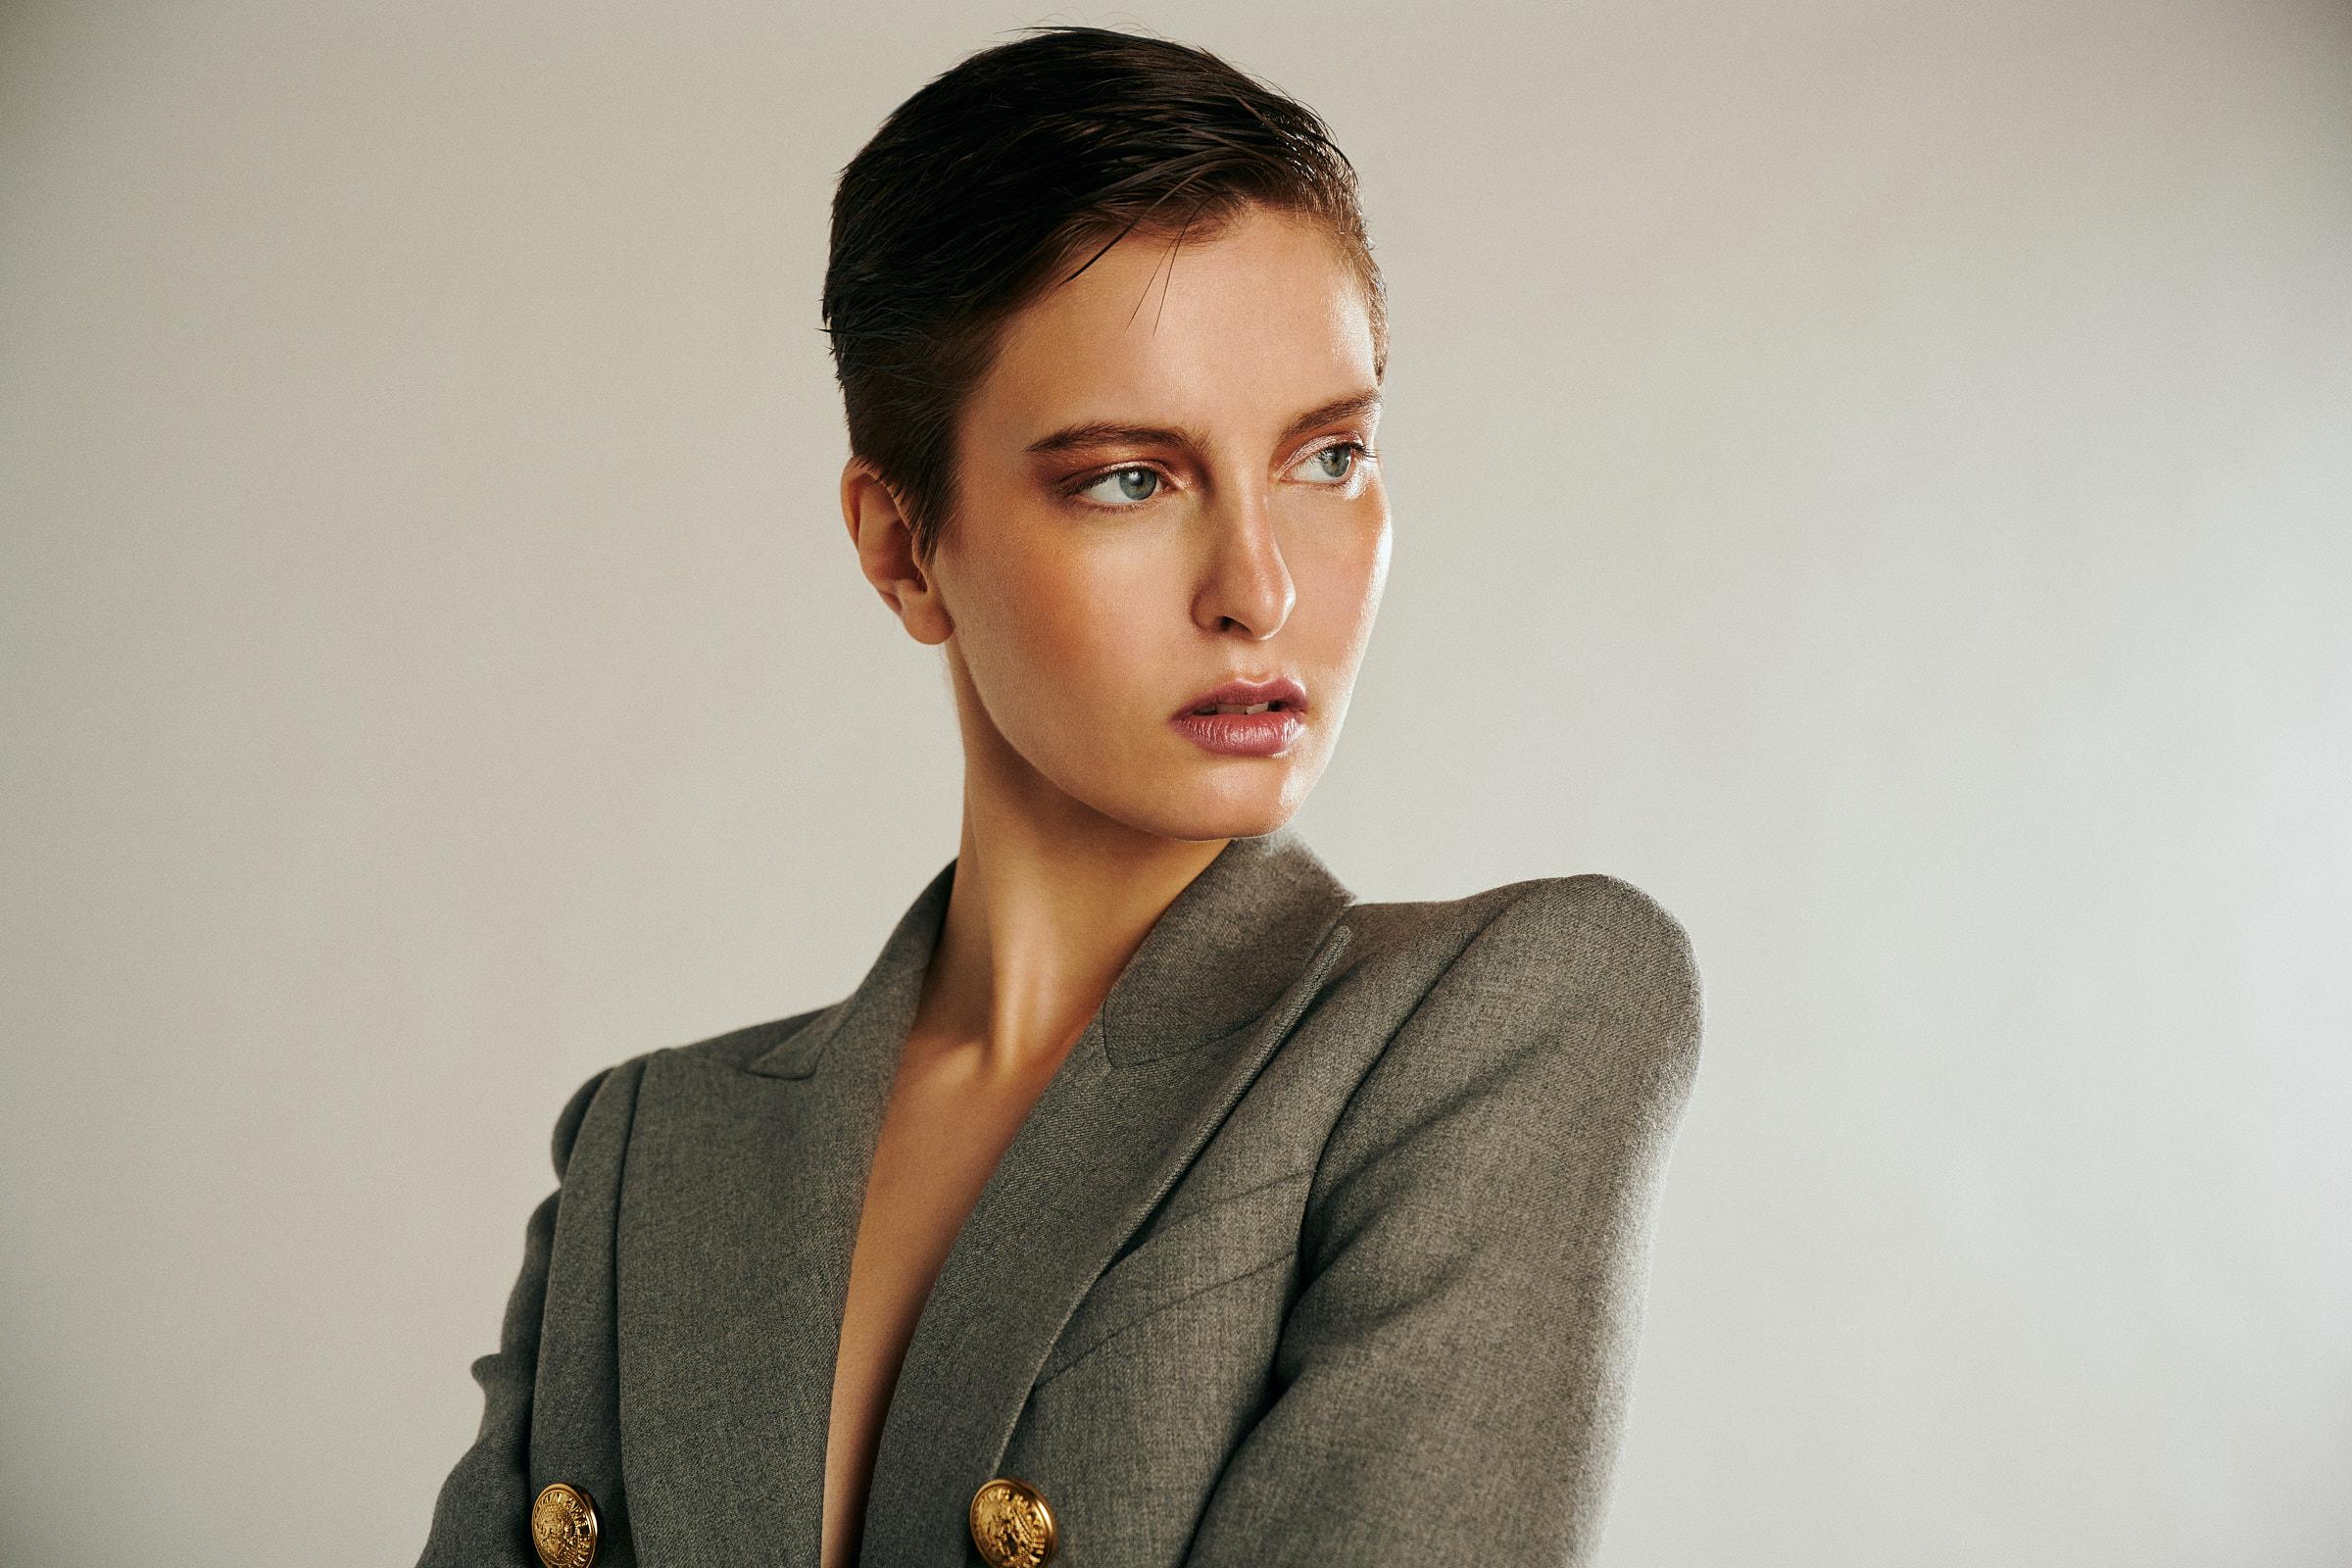 Model Jordan Swail wearing Balmain shot by Noah Asanias